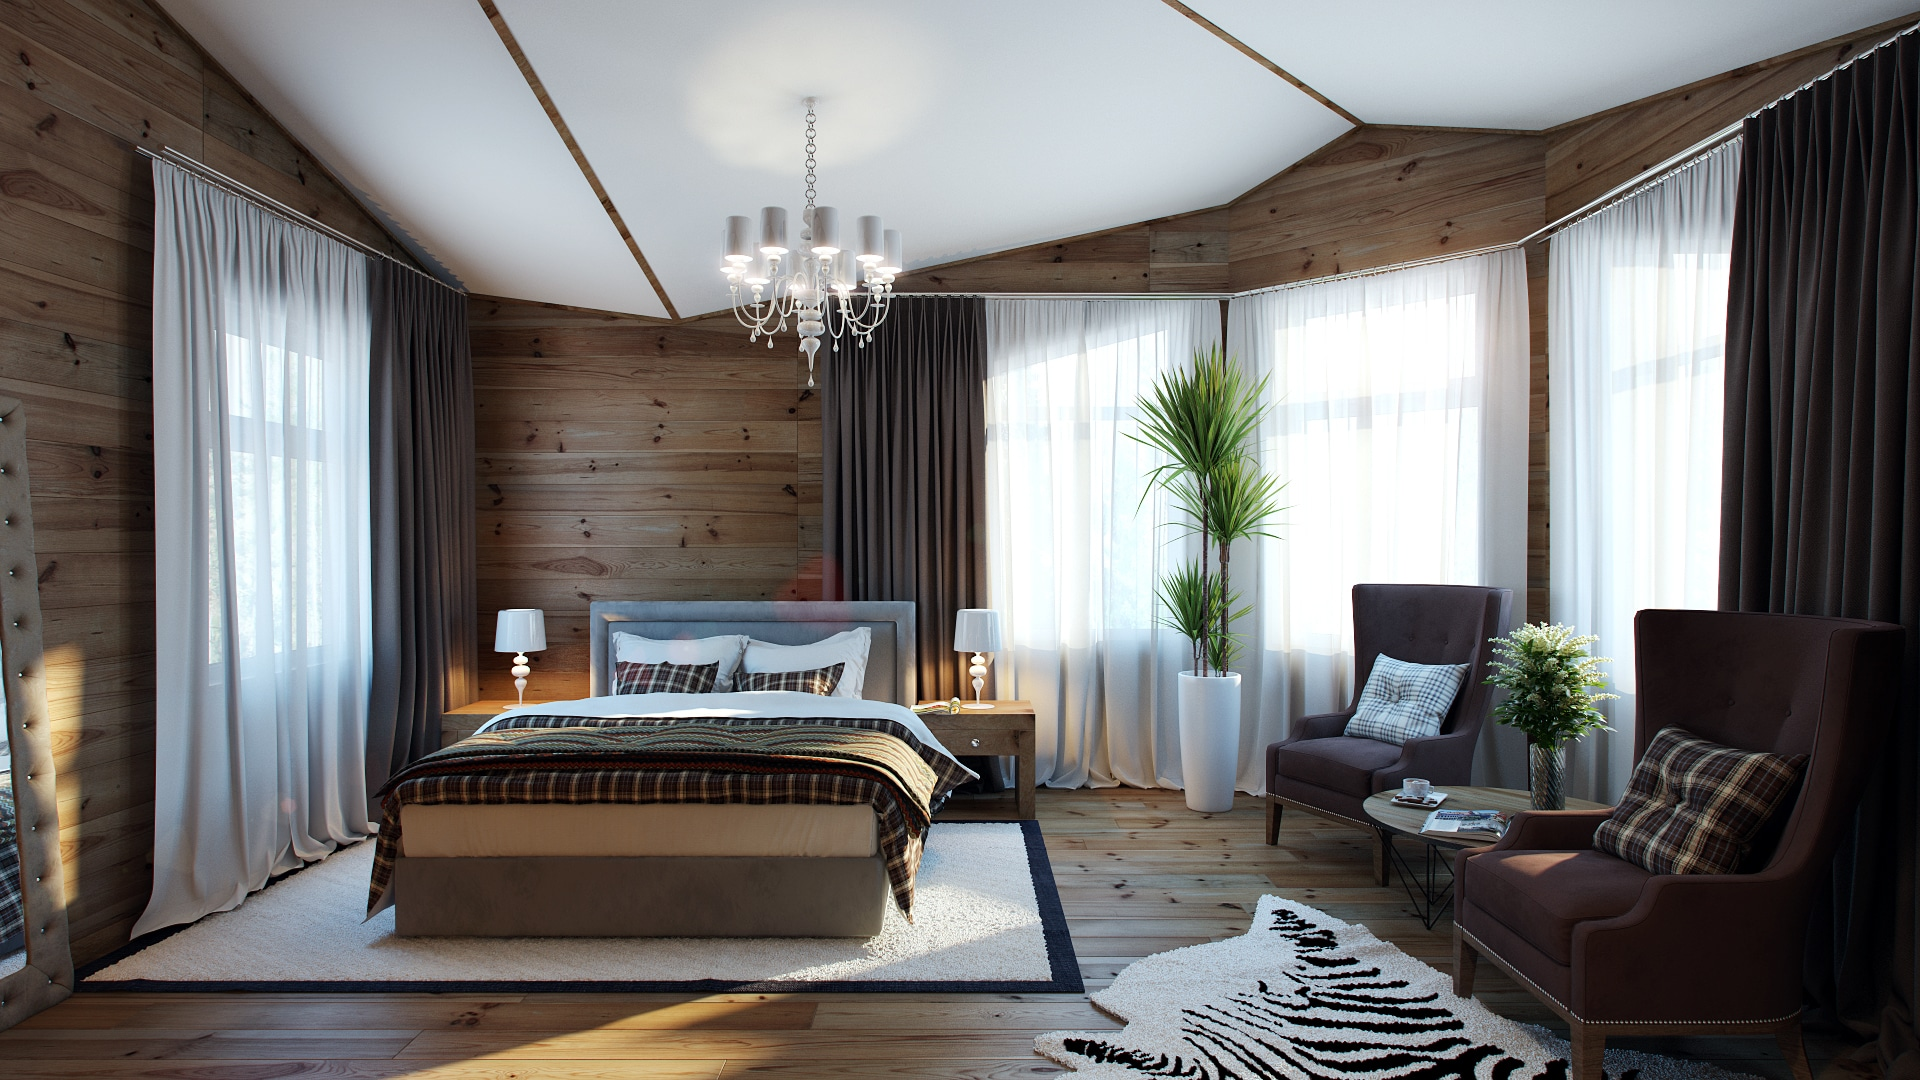 Dise o de dormitorio con paredes y piso de madera pavel for Disenos de paredes para dormitorios